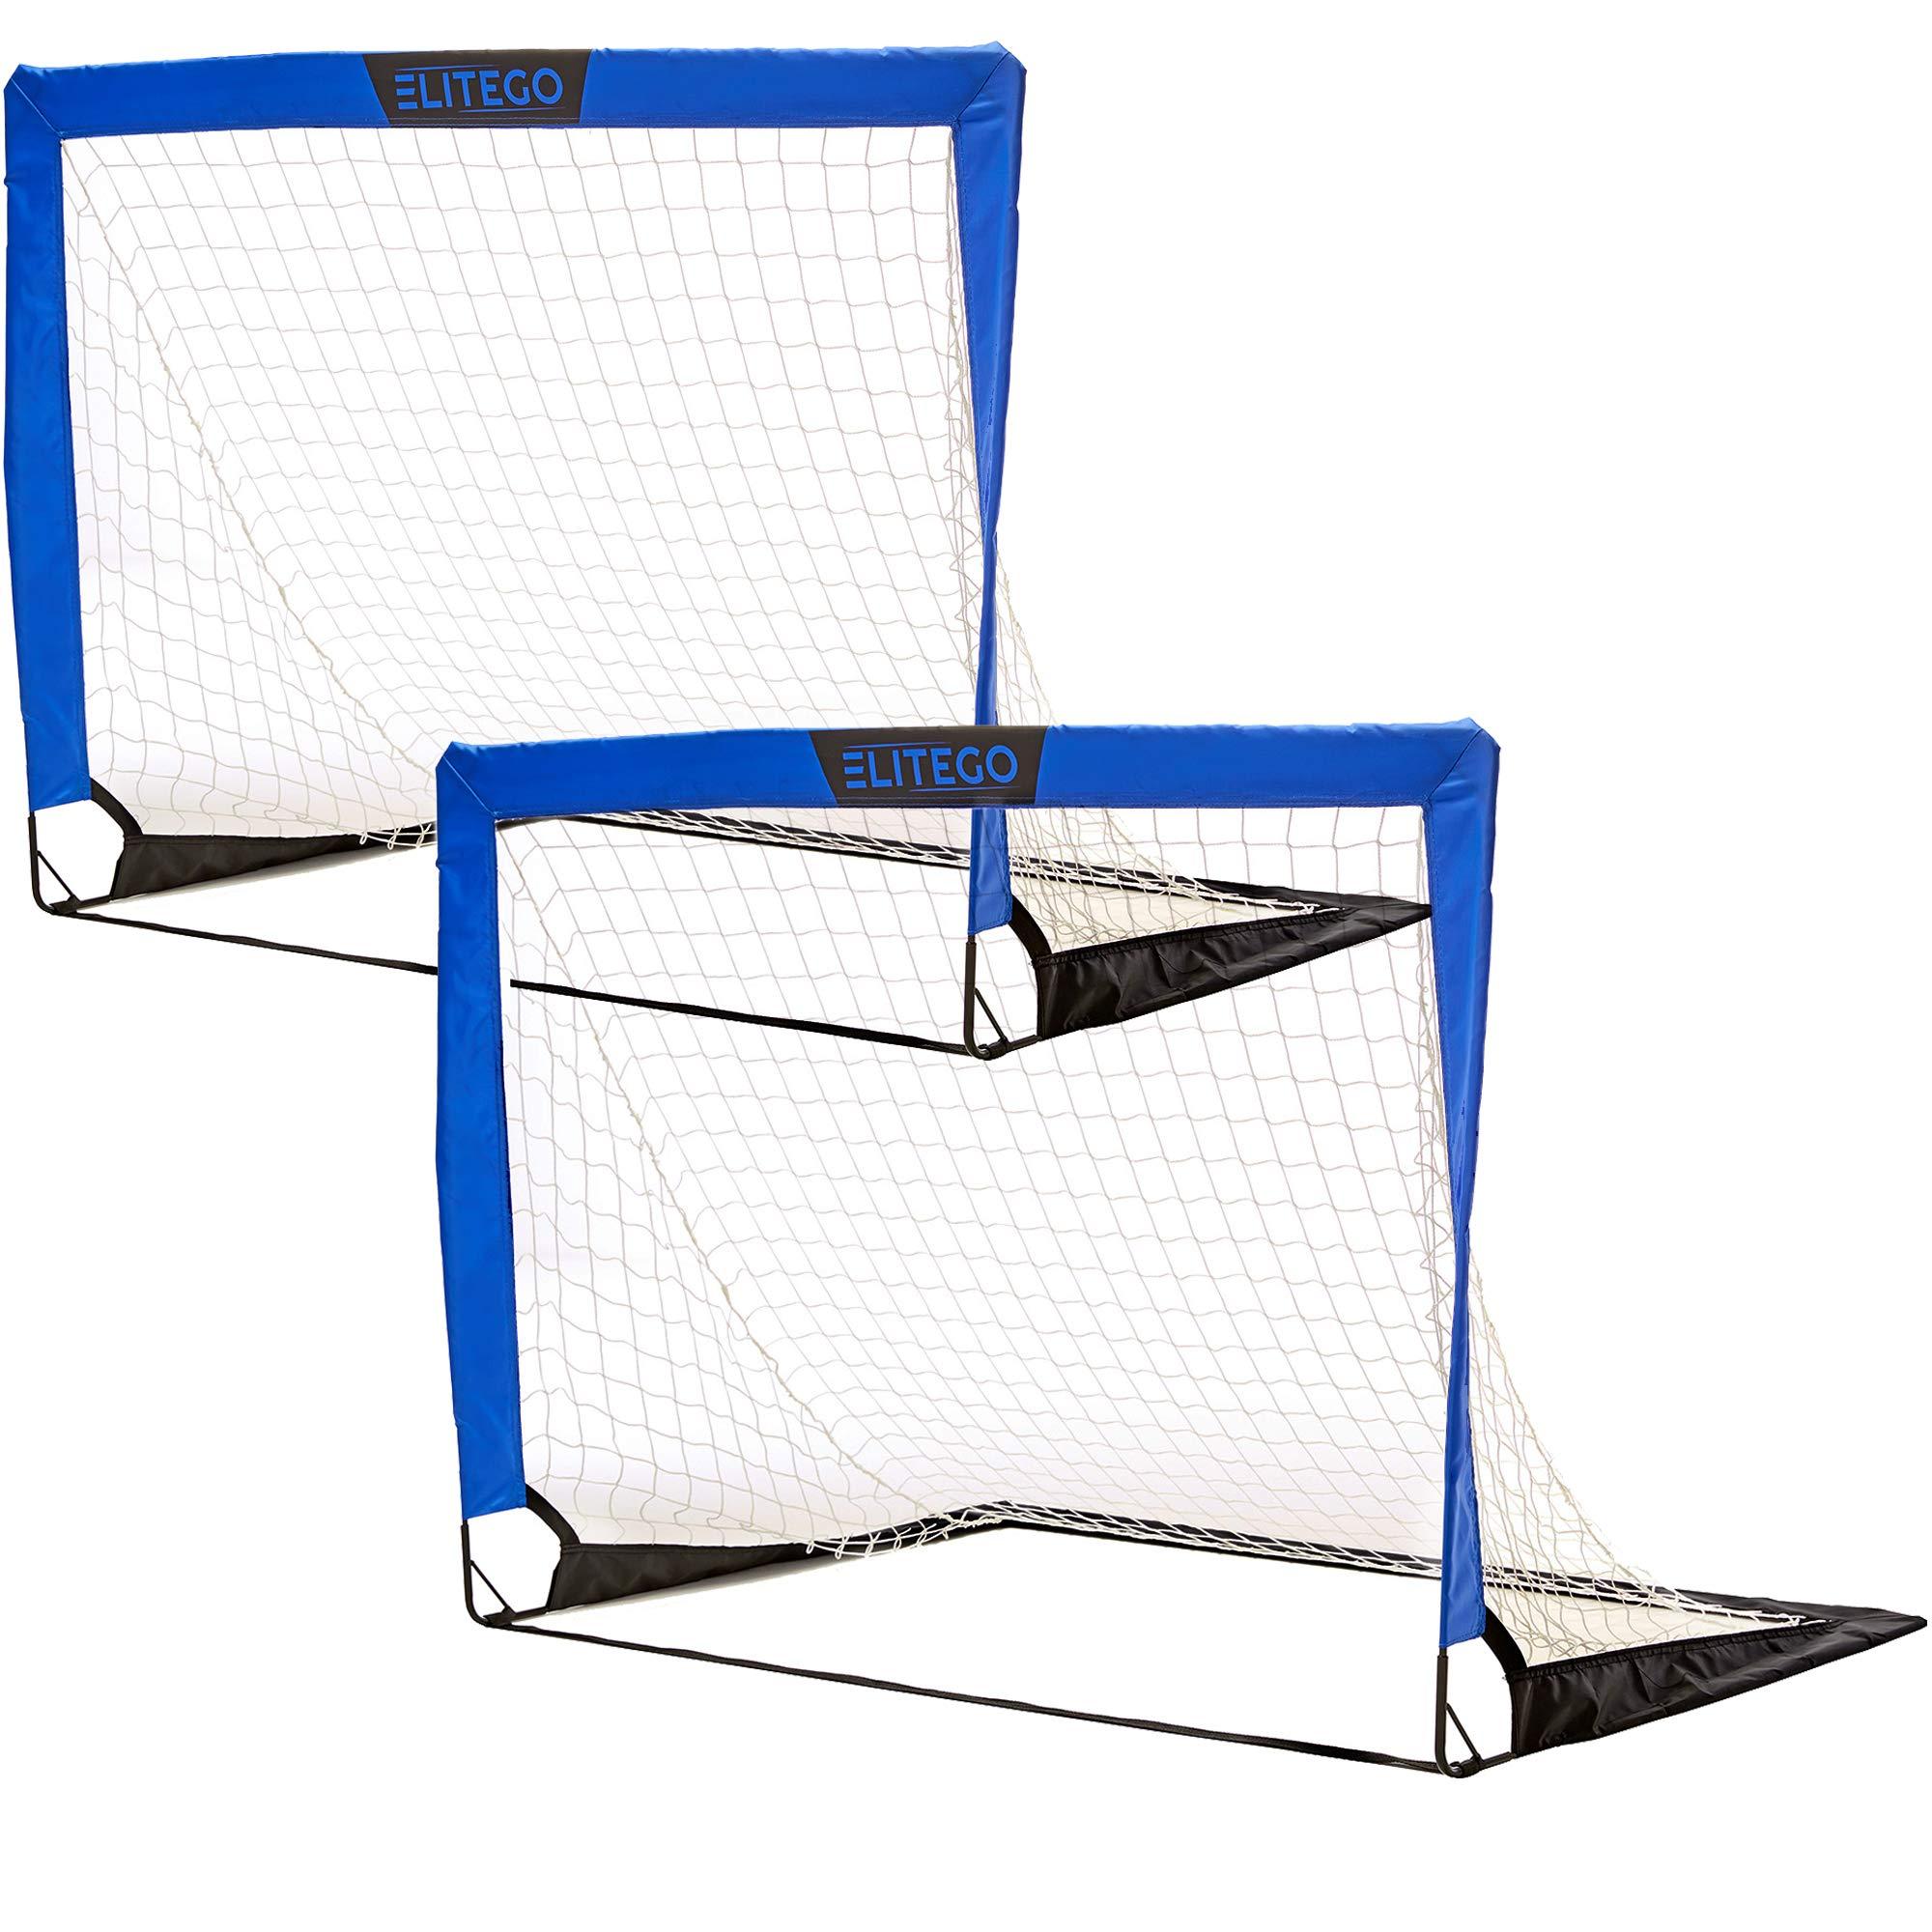 EliteGo Portable Soccer Goal   Instant Pop Up Net   Fiberglass Poles, Sets of 2 (Blue)